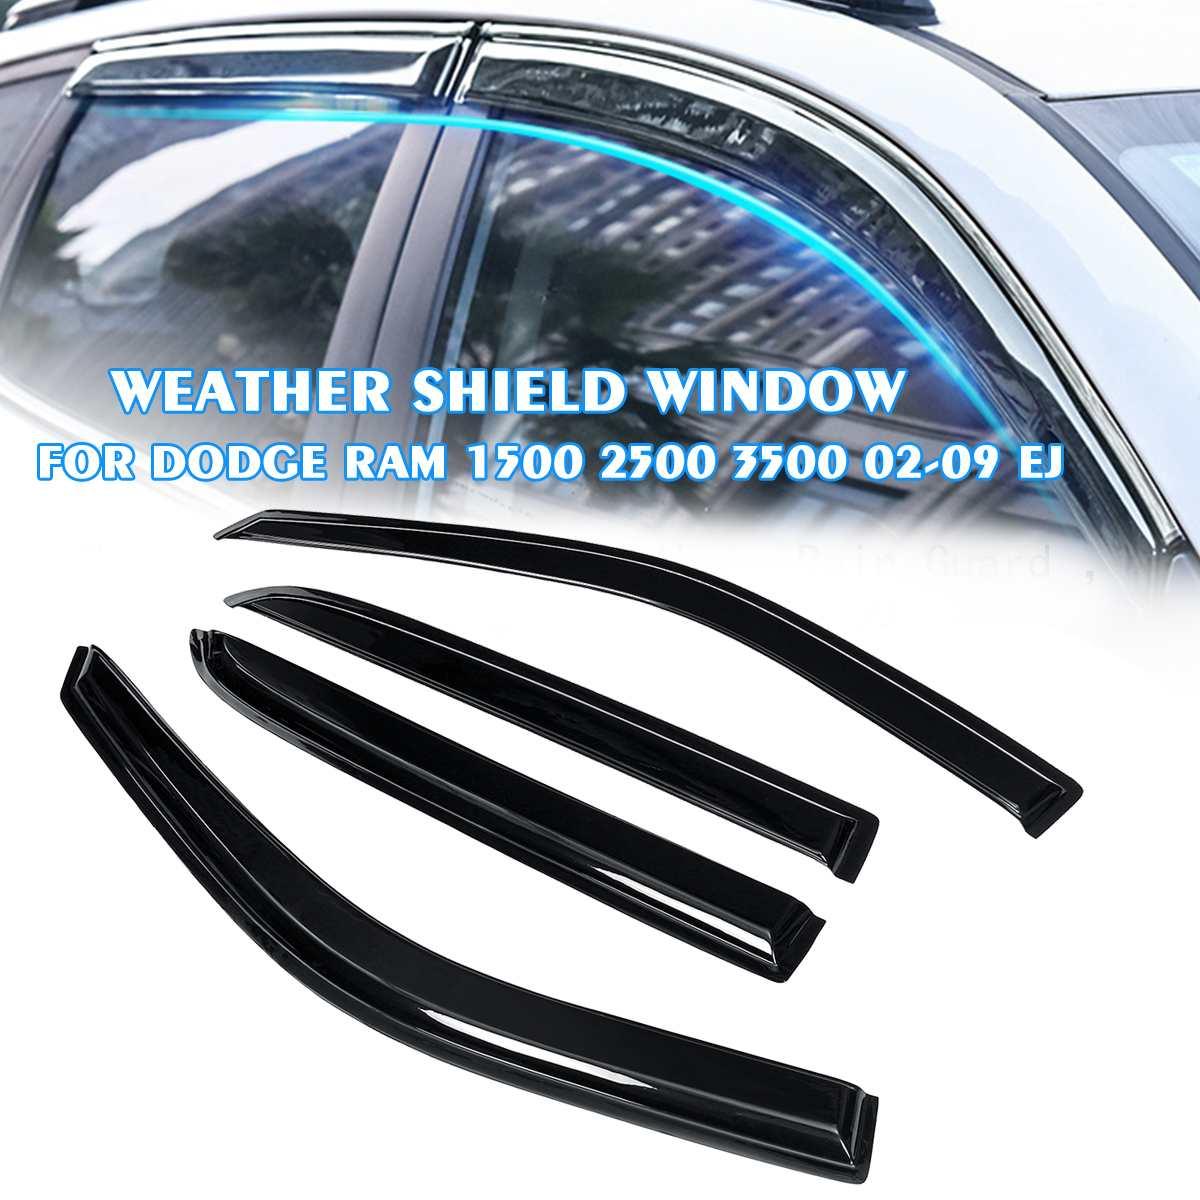 Autoleader 4PCS/Set Car Weathershields Window Visor For Dodge Ram 1500 2500 3500 09-18 EJ Deflector Rain Guard